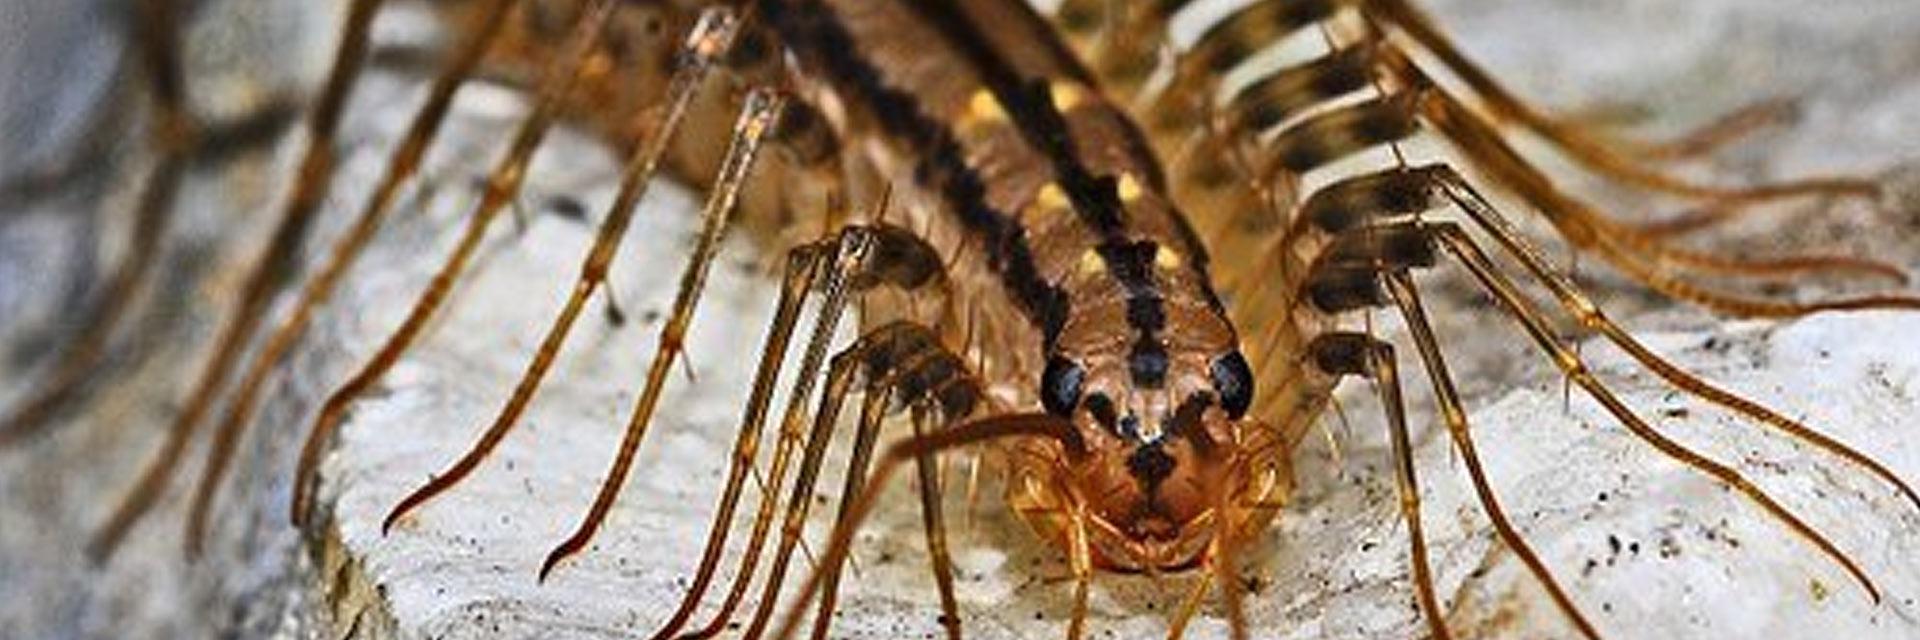 Corky's Centipede Control Service